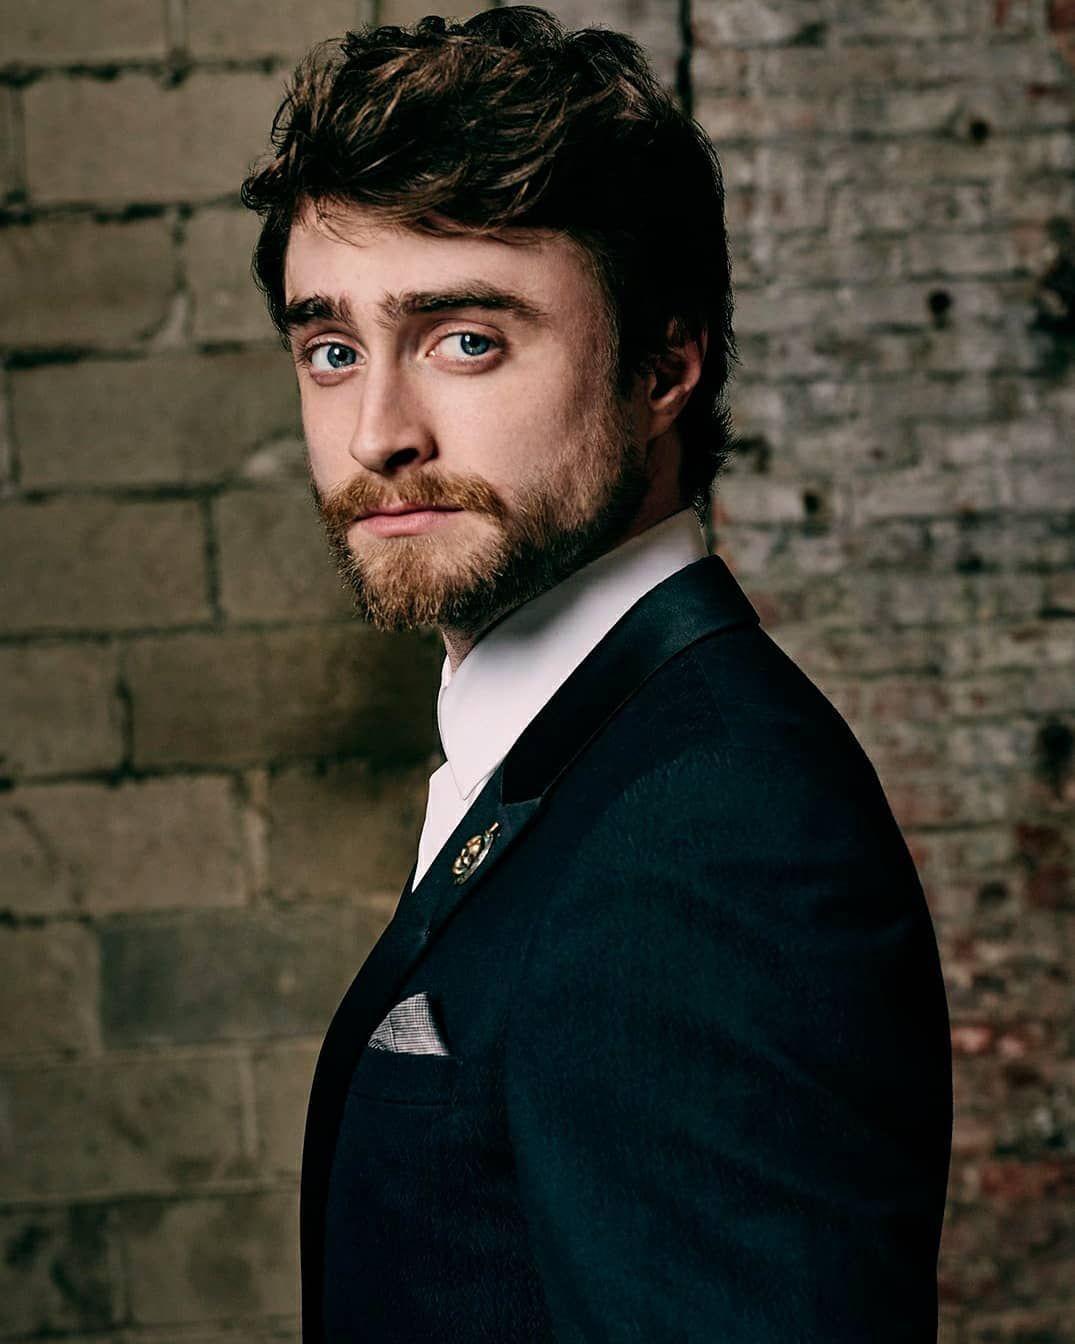 Daniel Radcliffe Instagram Post • Aug 12, 2019 at 6:38 UTC - Daniel  Radcliffe... - Daniel Radcliffe Insta… in 2020 | Daniel radcliffe, Daniel  radcliffe photoshoot, Daniel